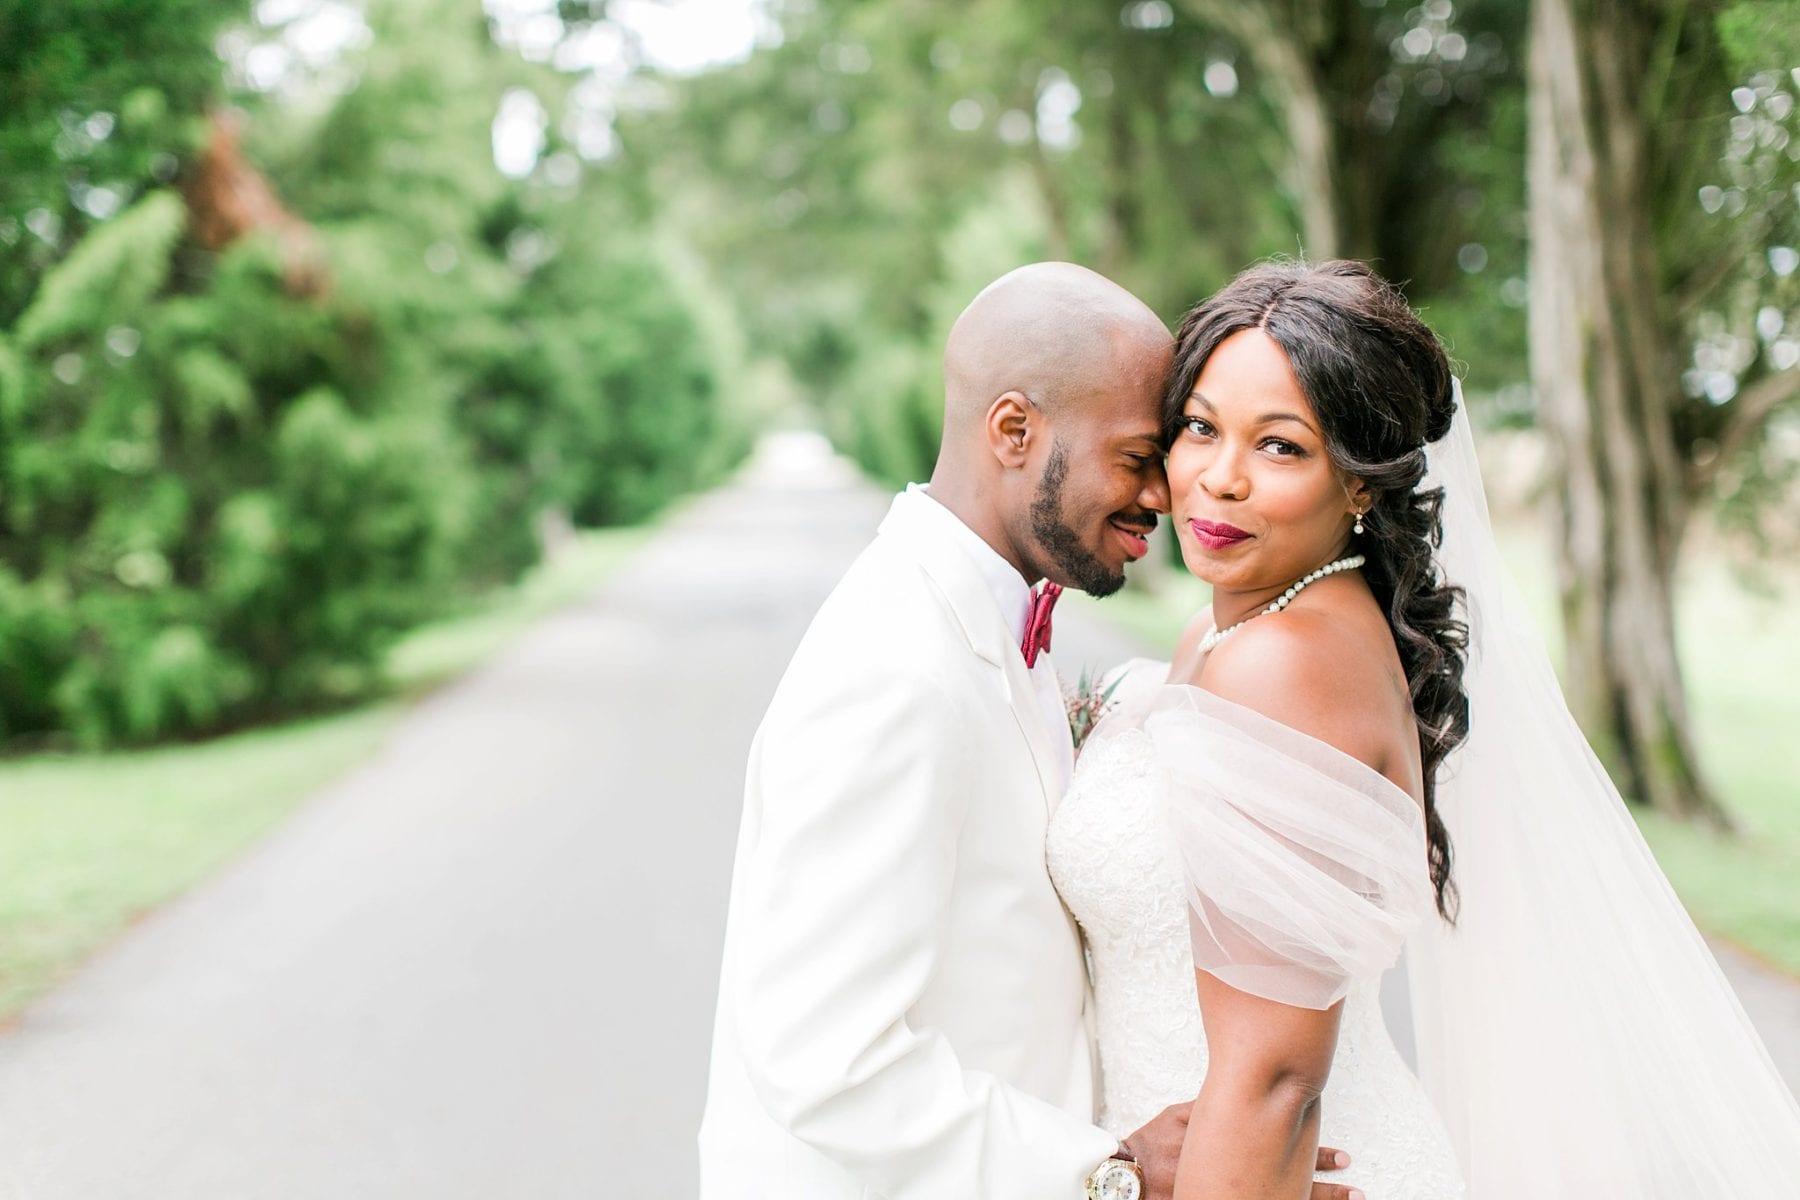 Jefferson Patterson Park Wedding Maryland Wedding Photographer Megan Kelsey Photography Jasmine & Seyi-53.jpg